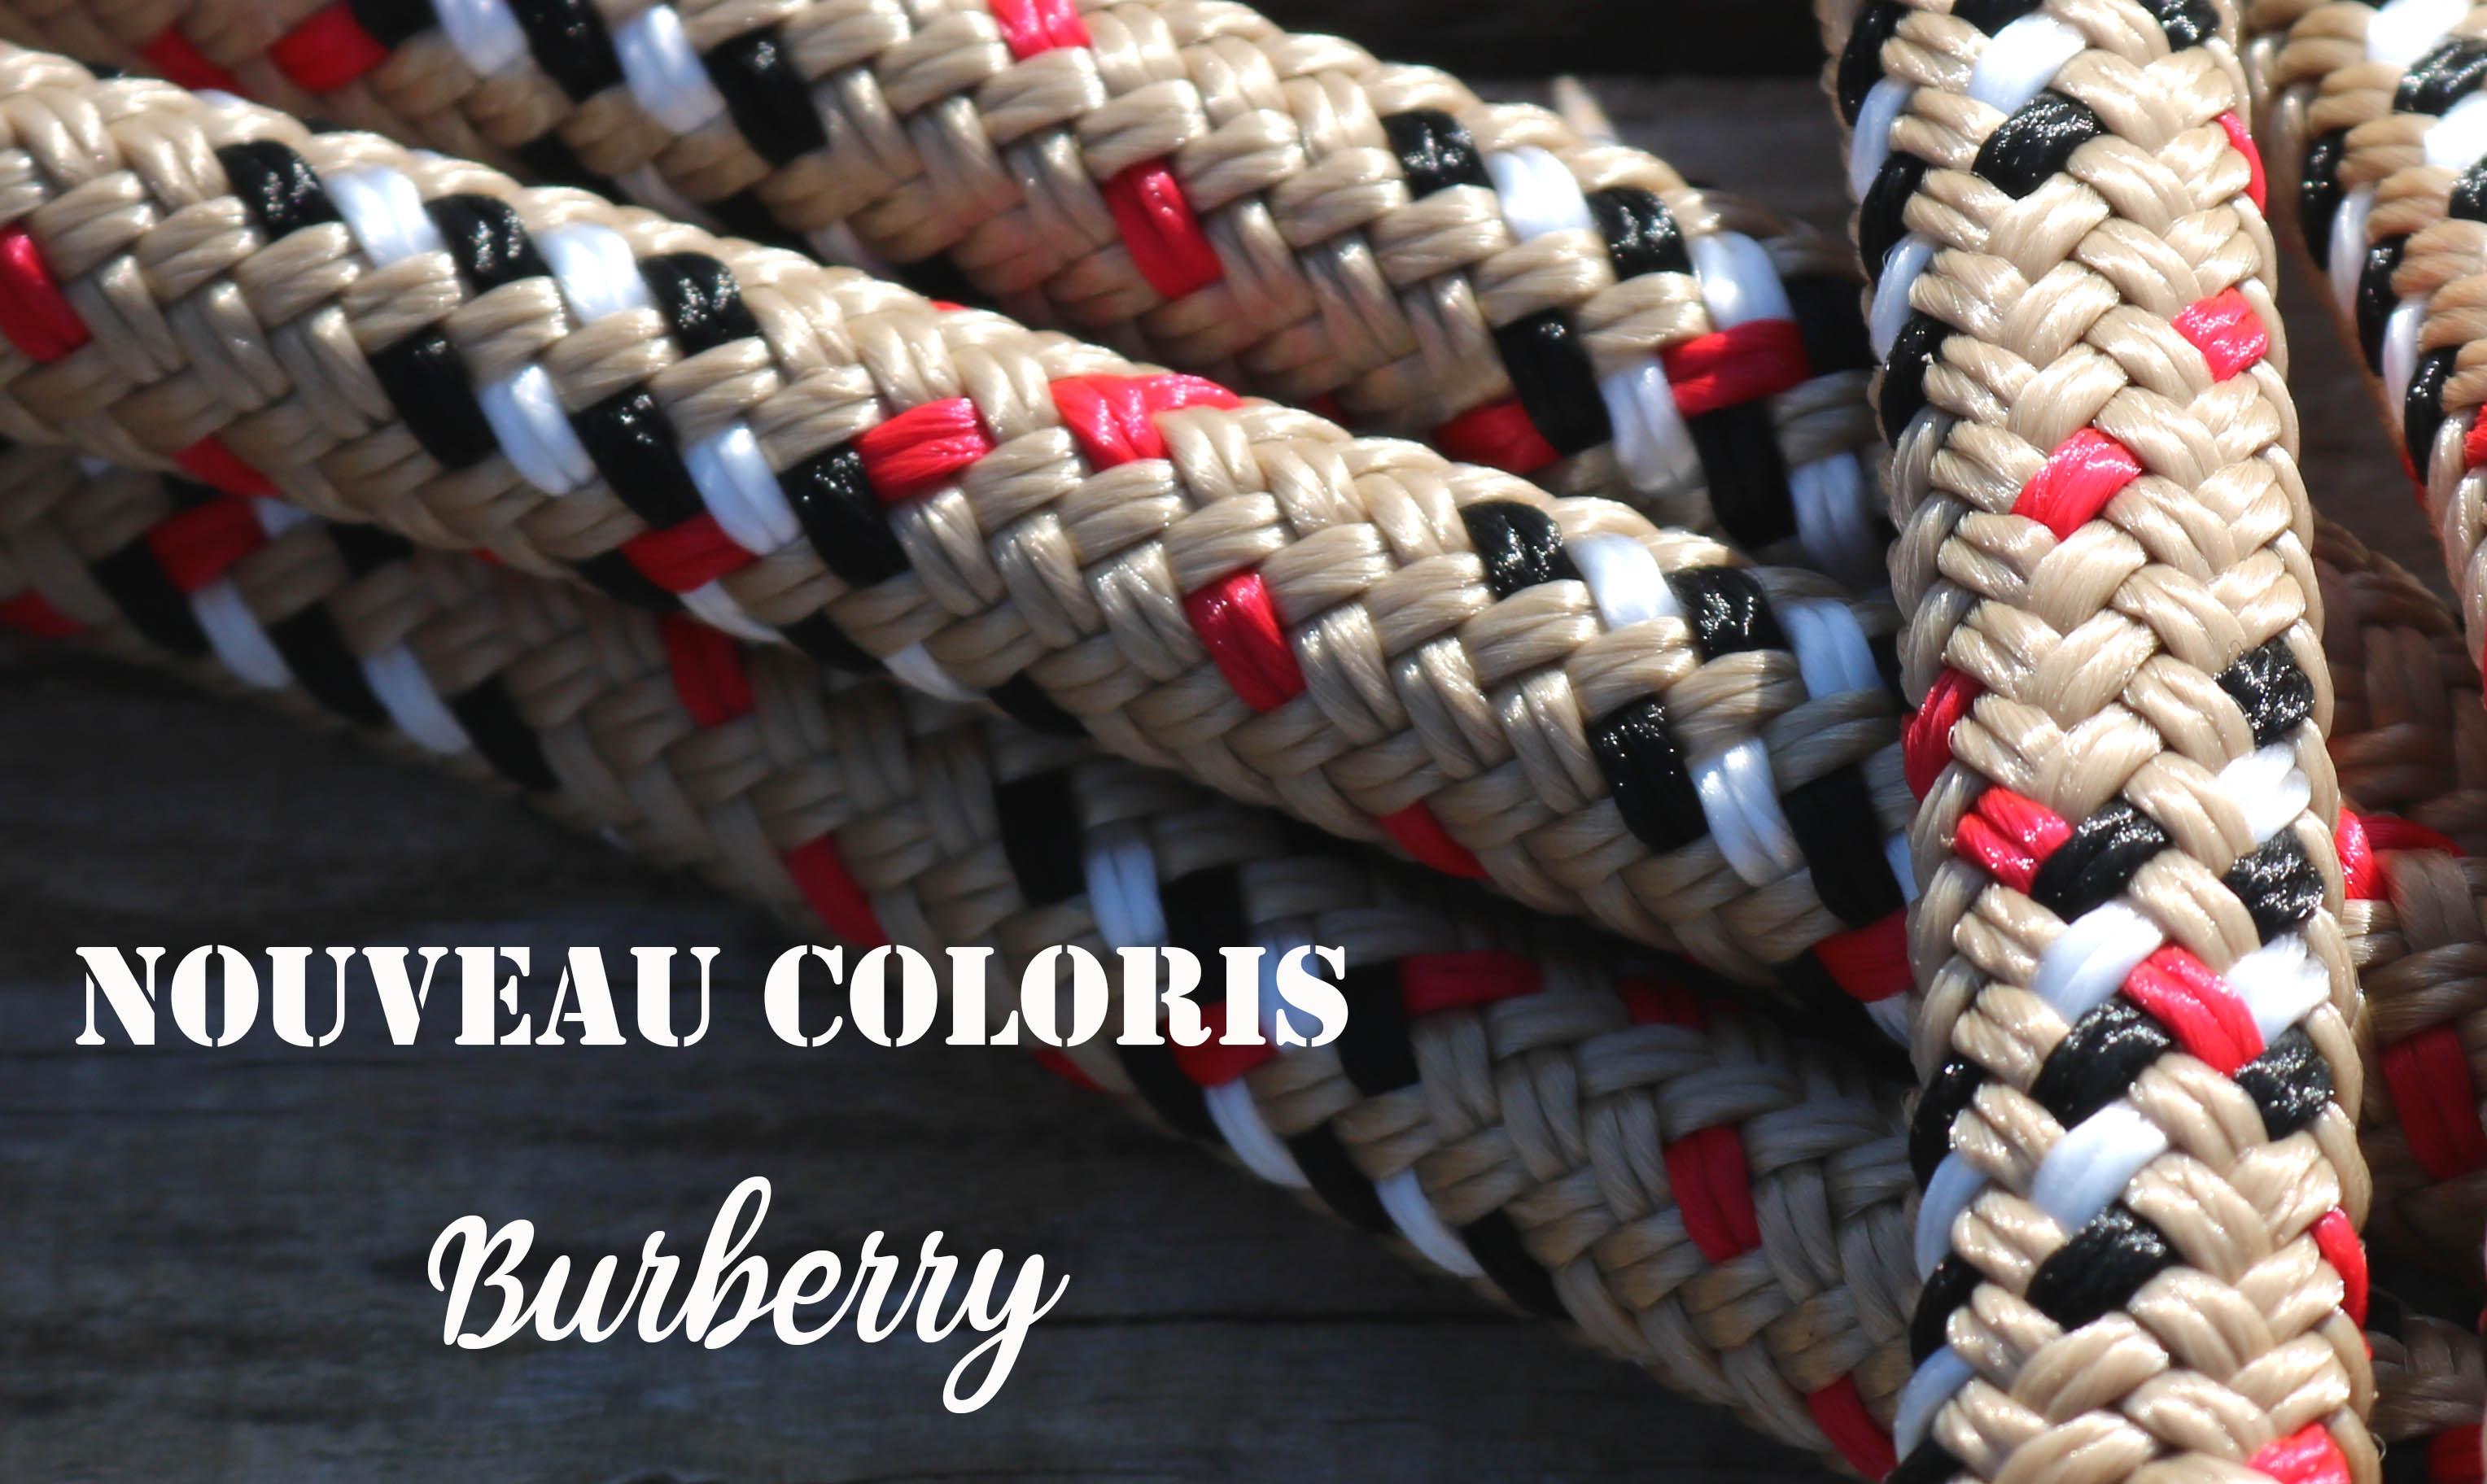 Nouveau coloris gamme fun